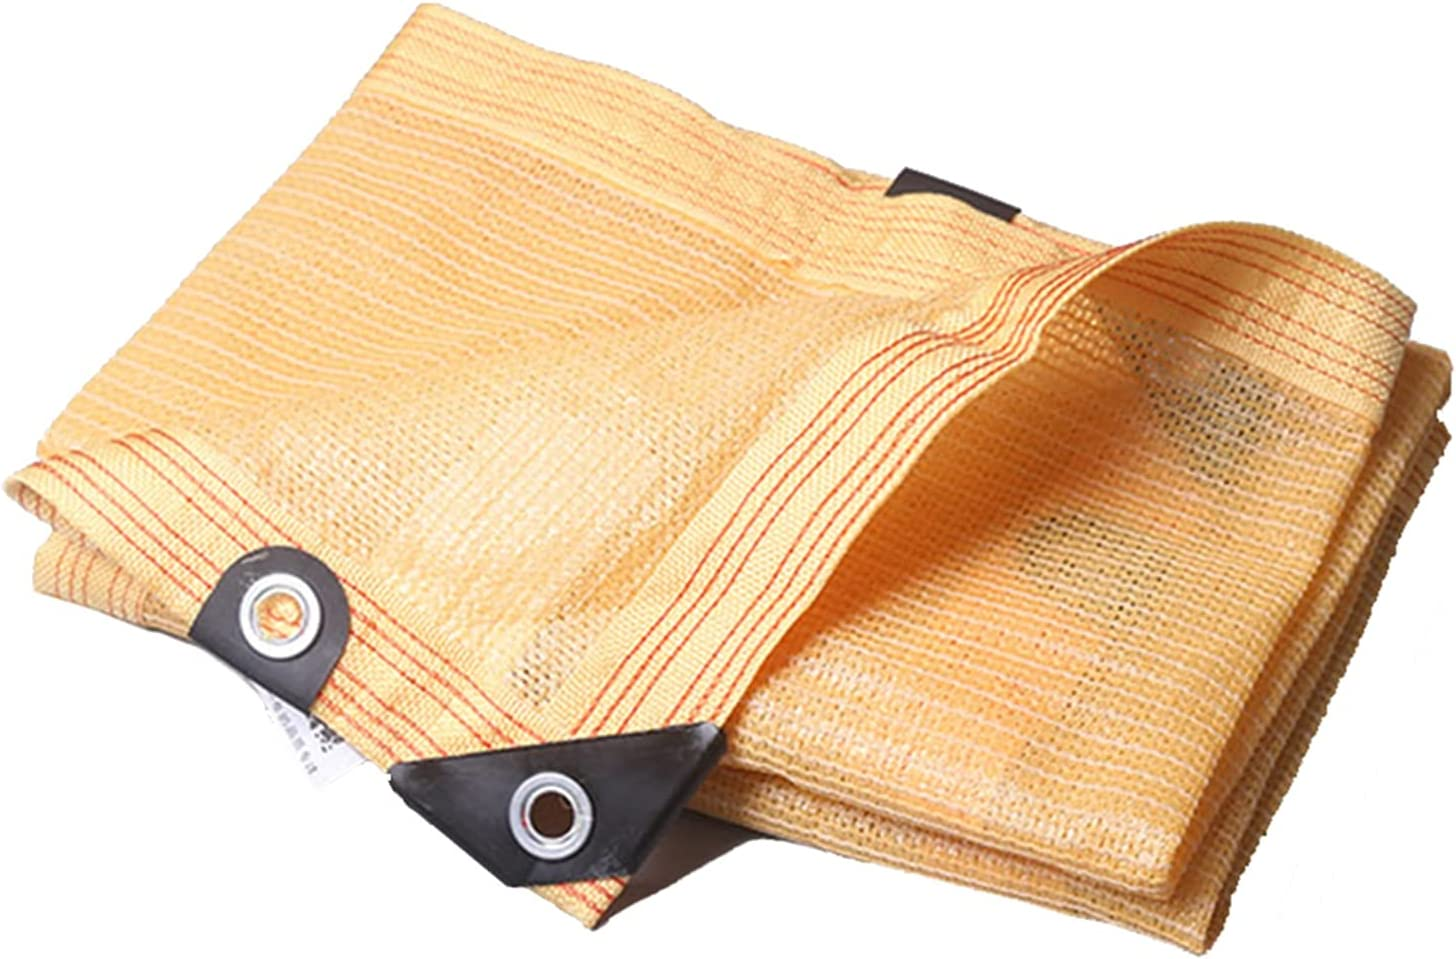 Price reduction WZHIJUN Sunblock Cash special price Shade Cloth 90% Terrace Anti-UV Outdoor Garden